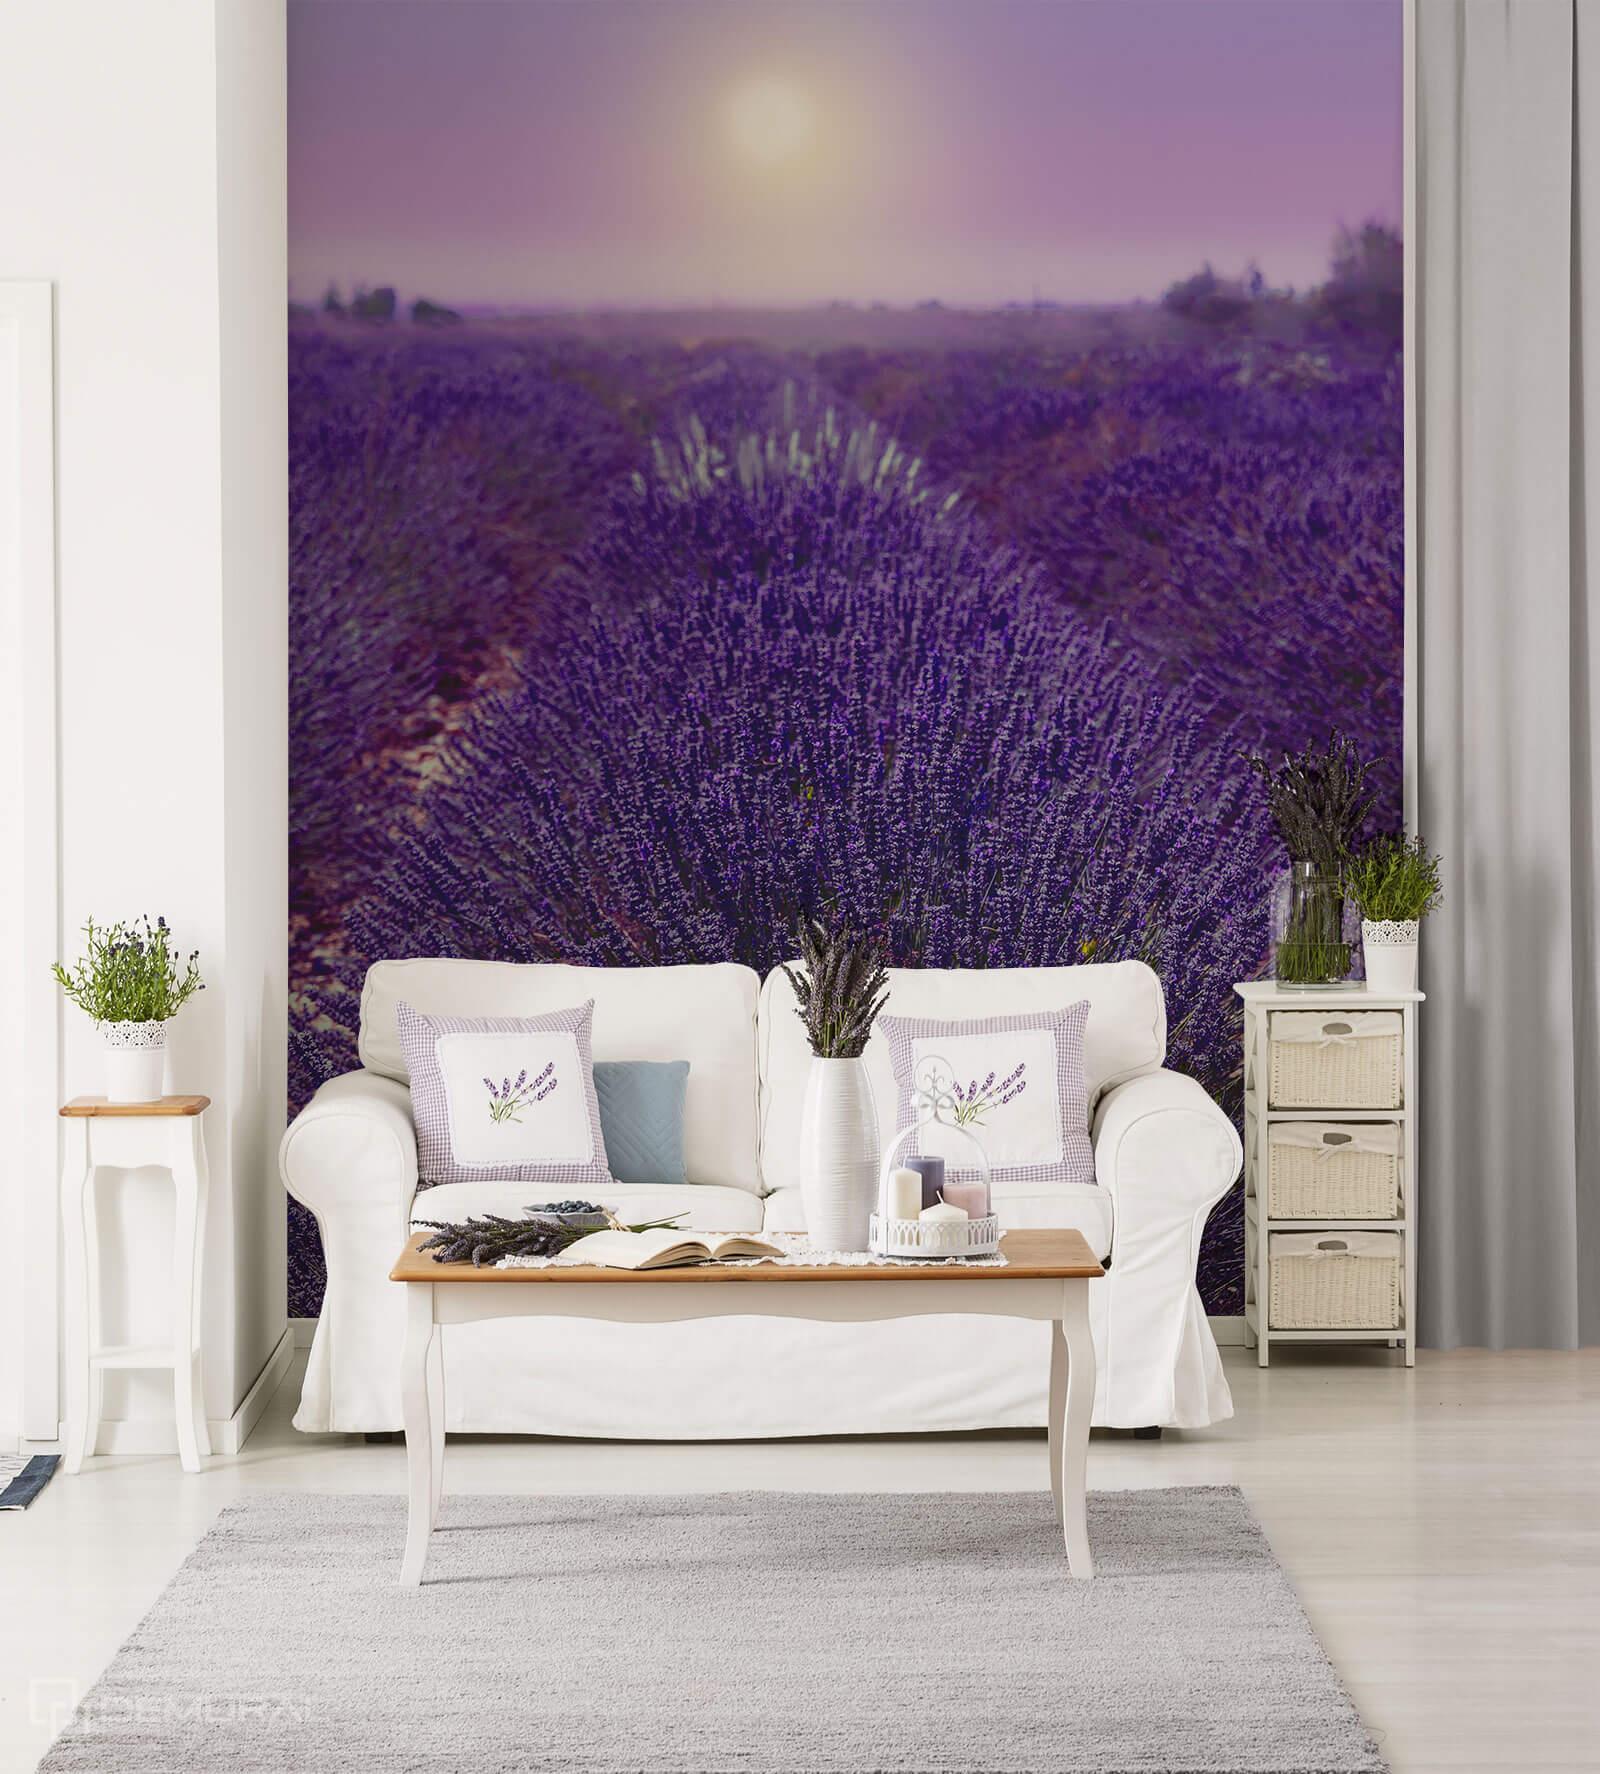 Photo wallpaper Provence fields - Ultraviolet wallpaper - Demural